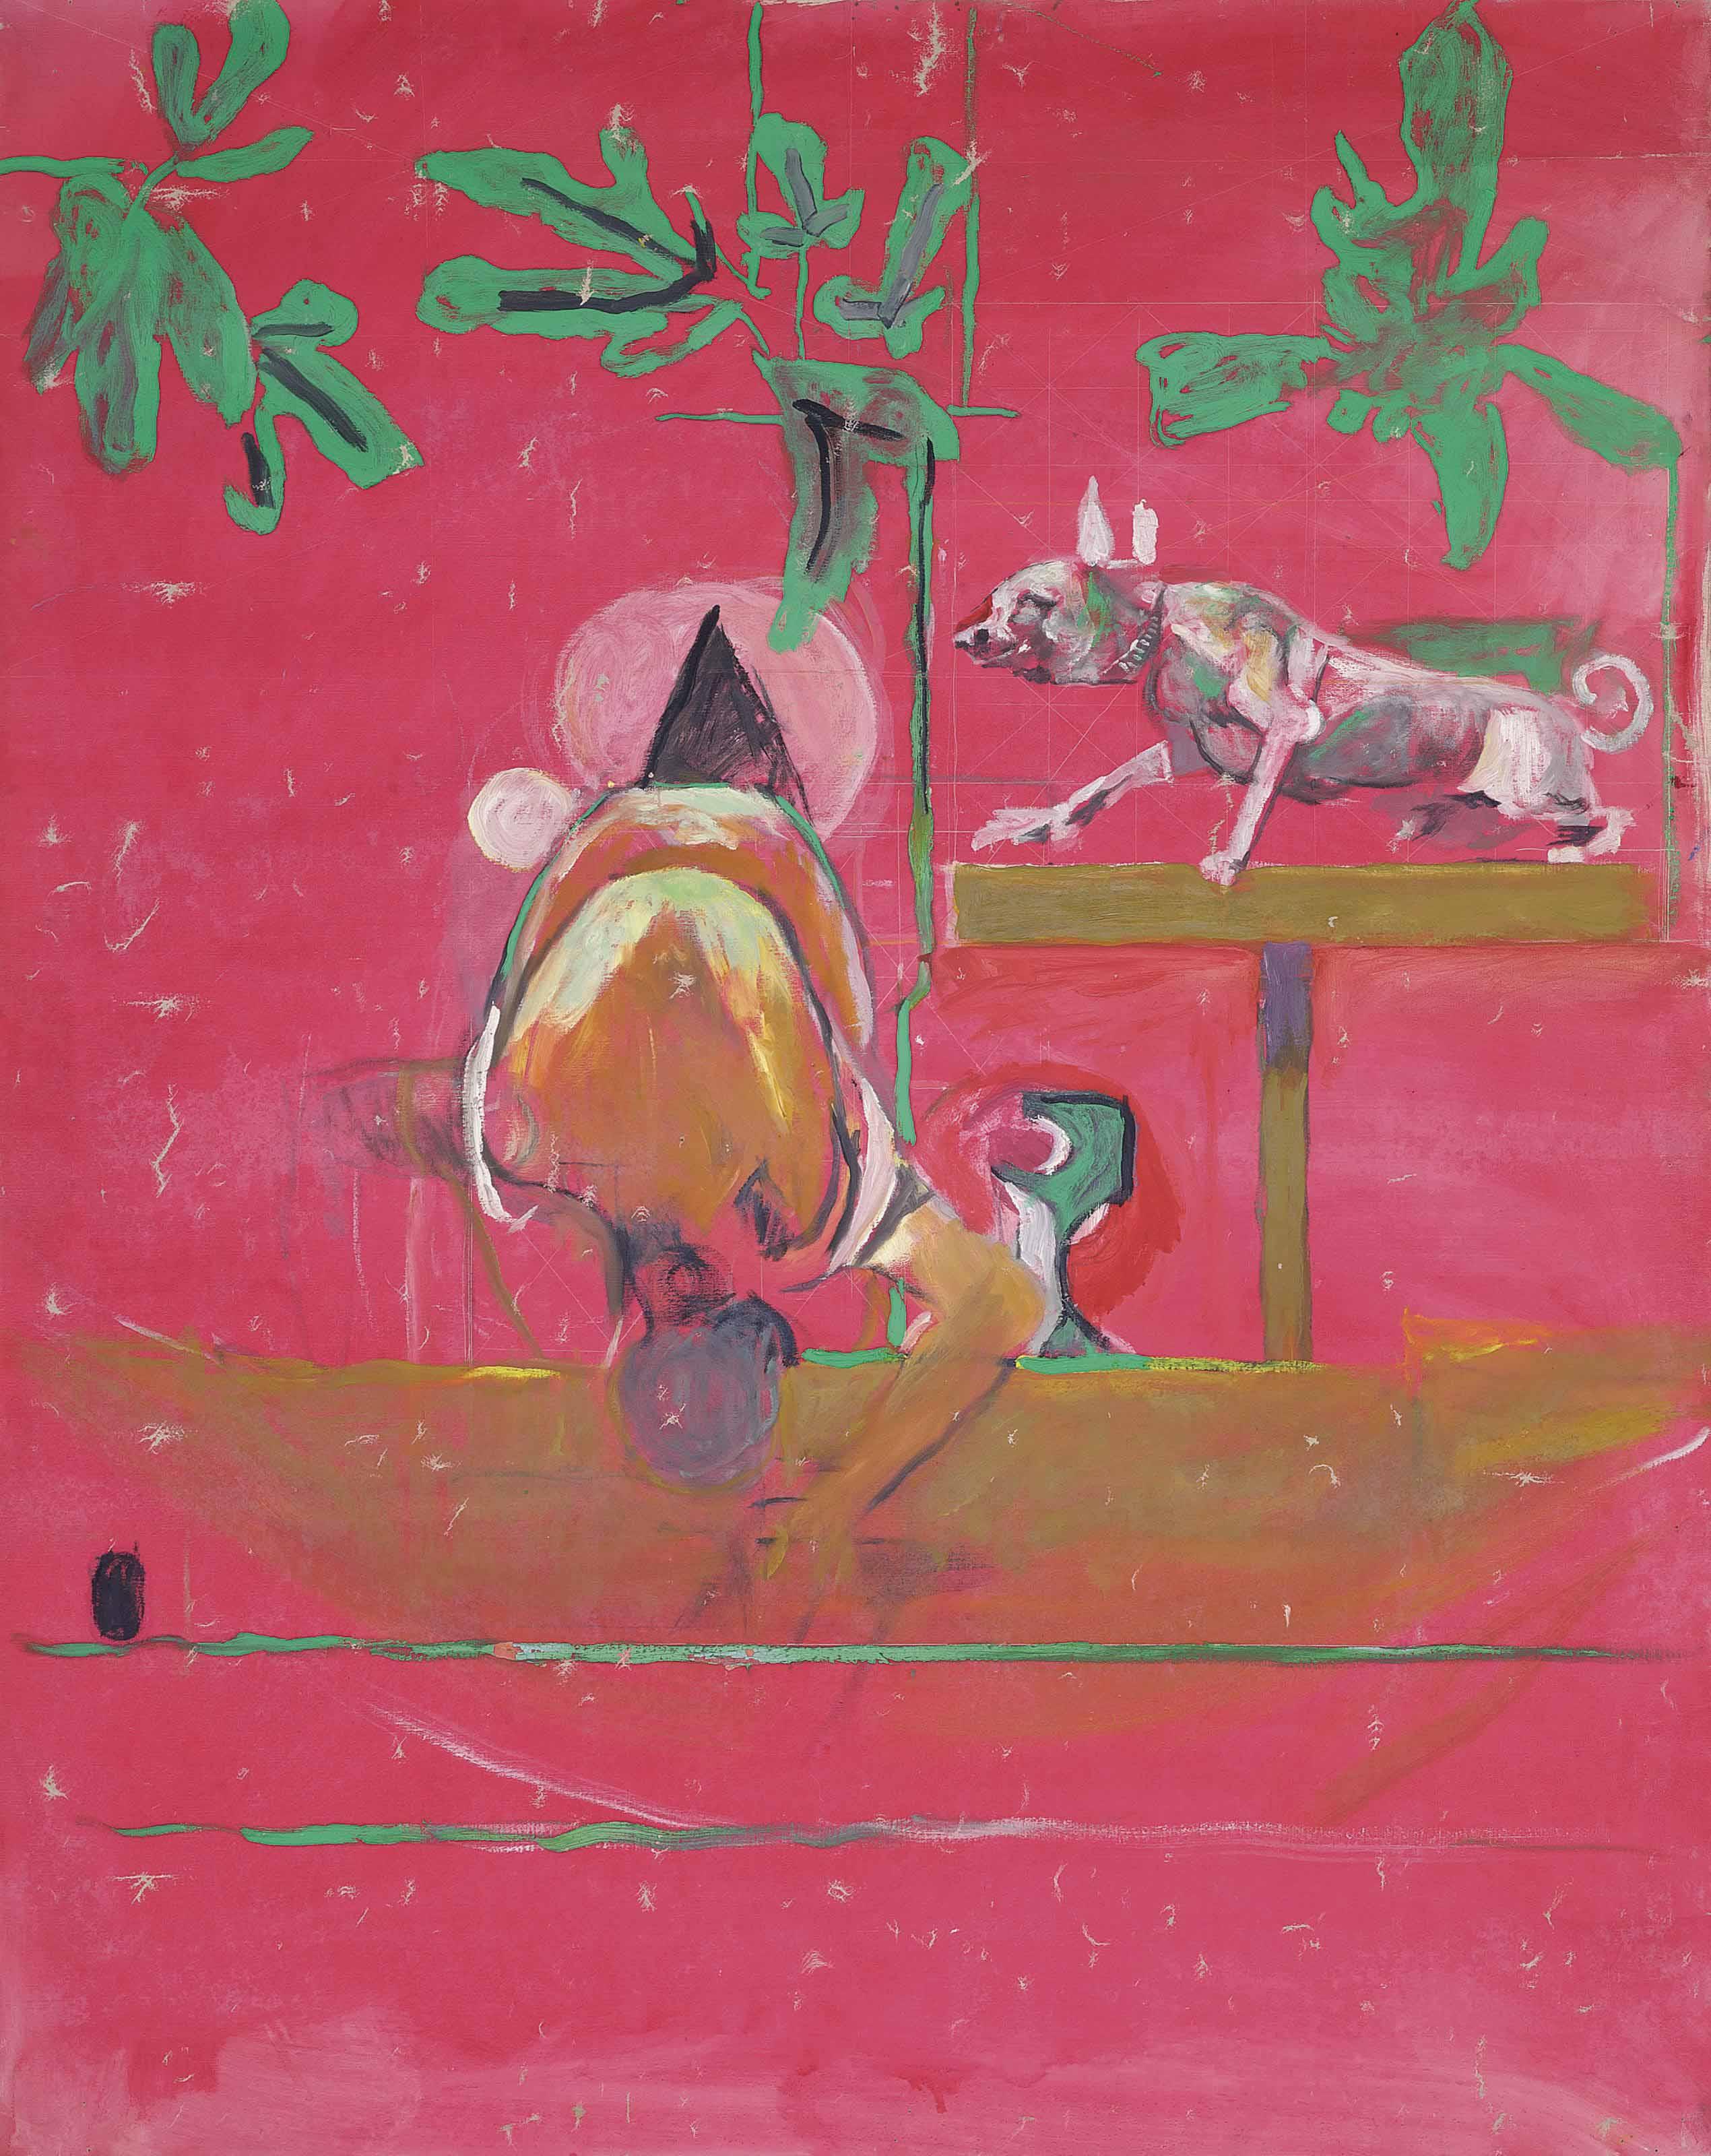 Graham Sutherland, O.M. (1903-1980)